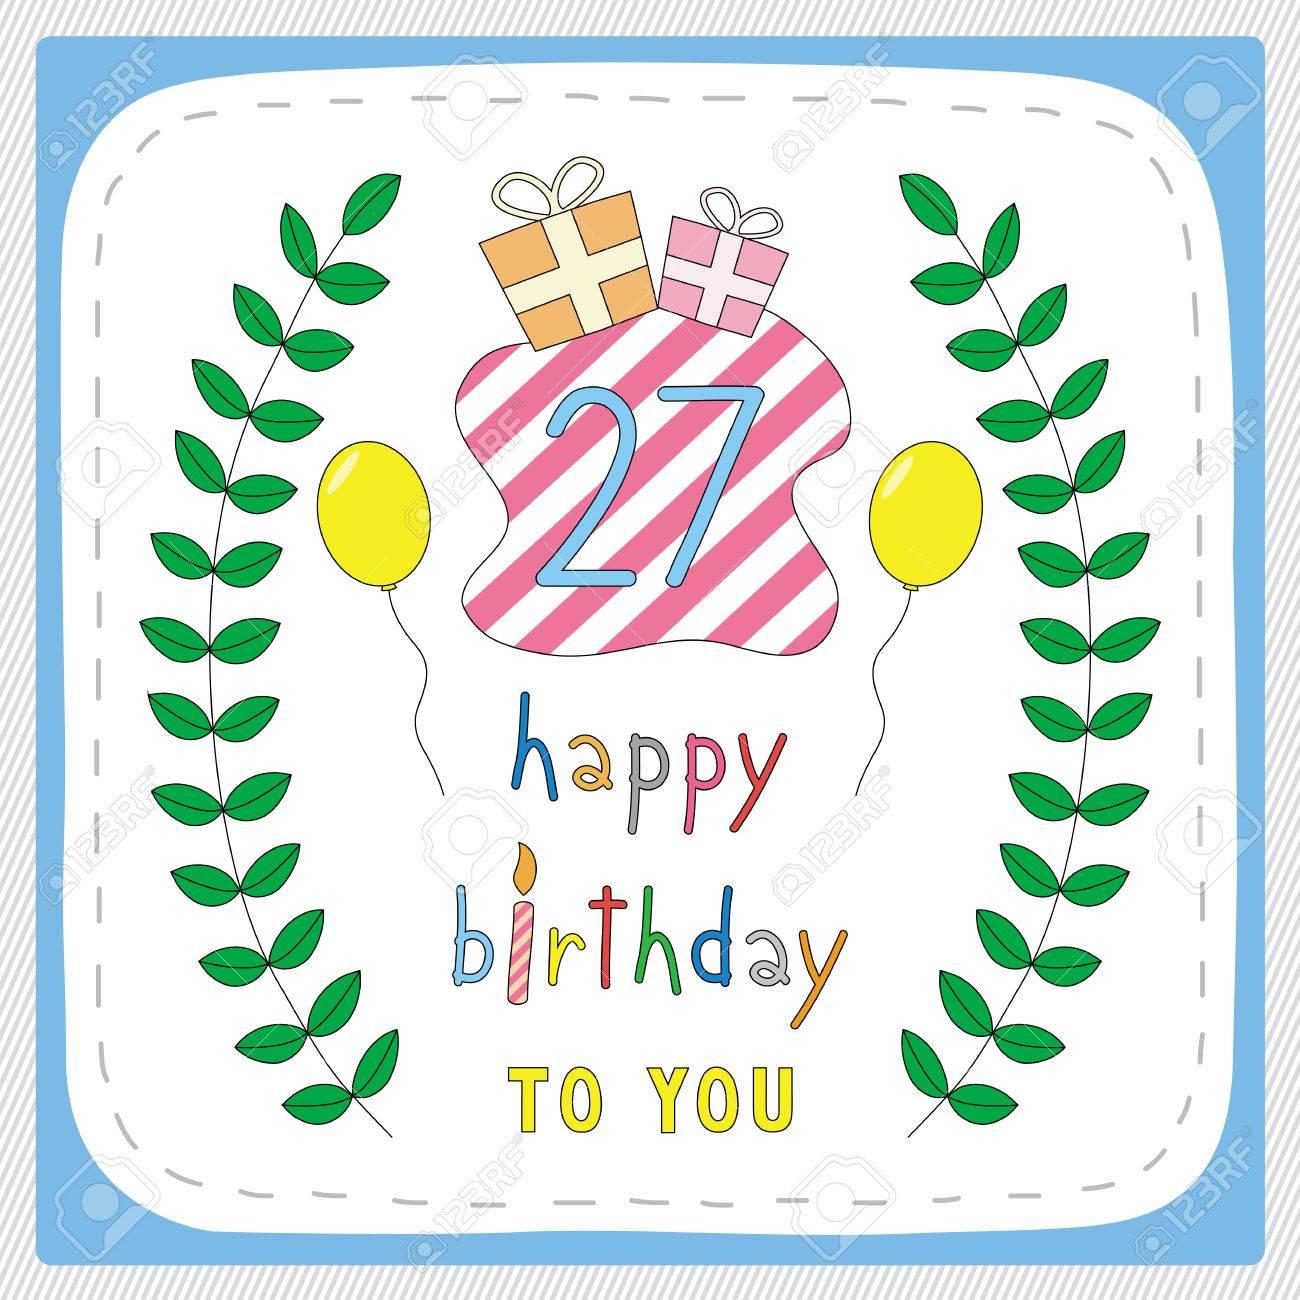 27 Dezember Geburtstag Karte Amazon De Burobedarf Schreibwaren